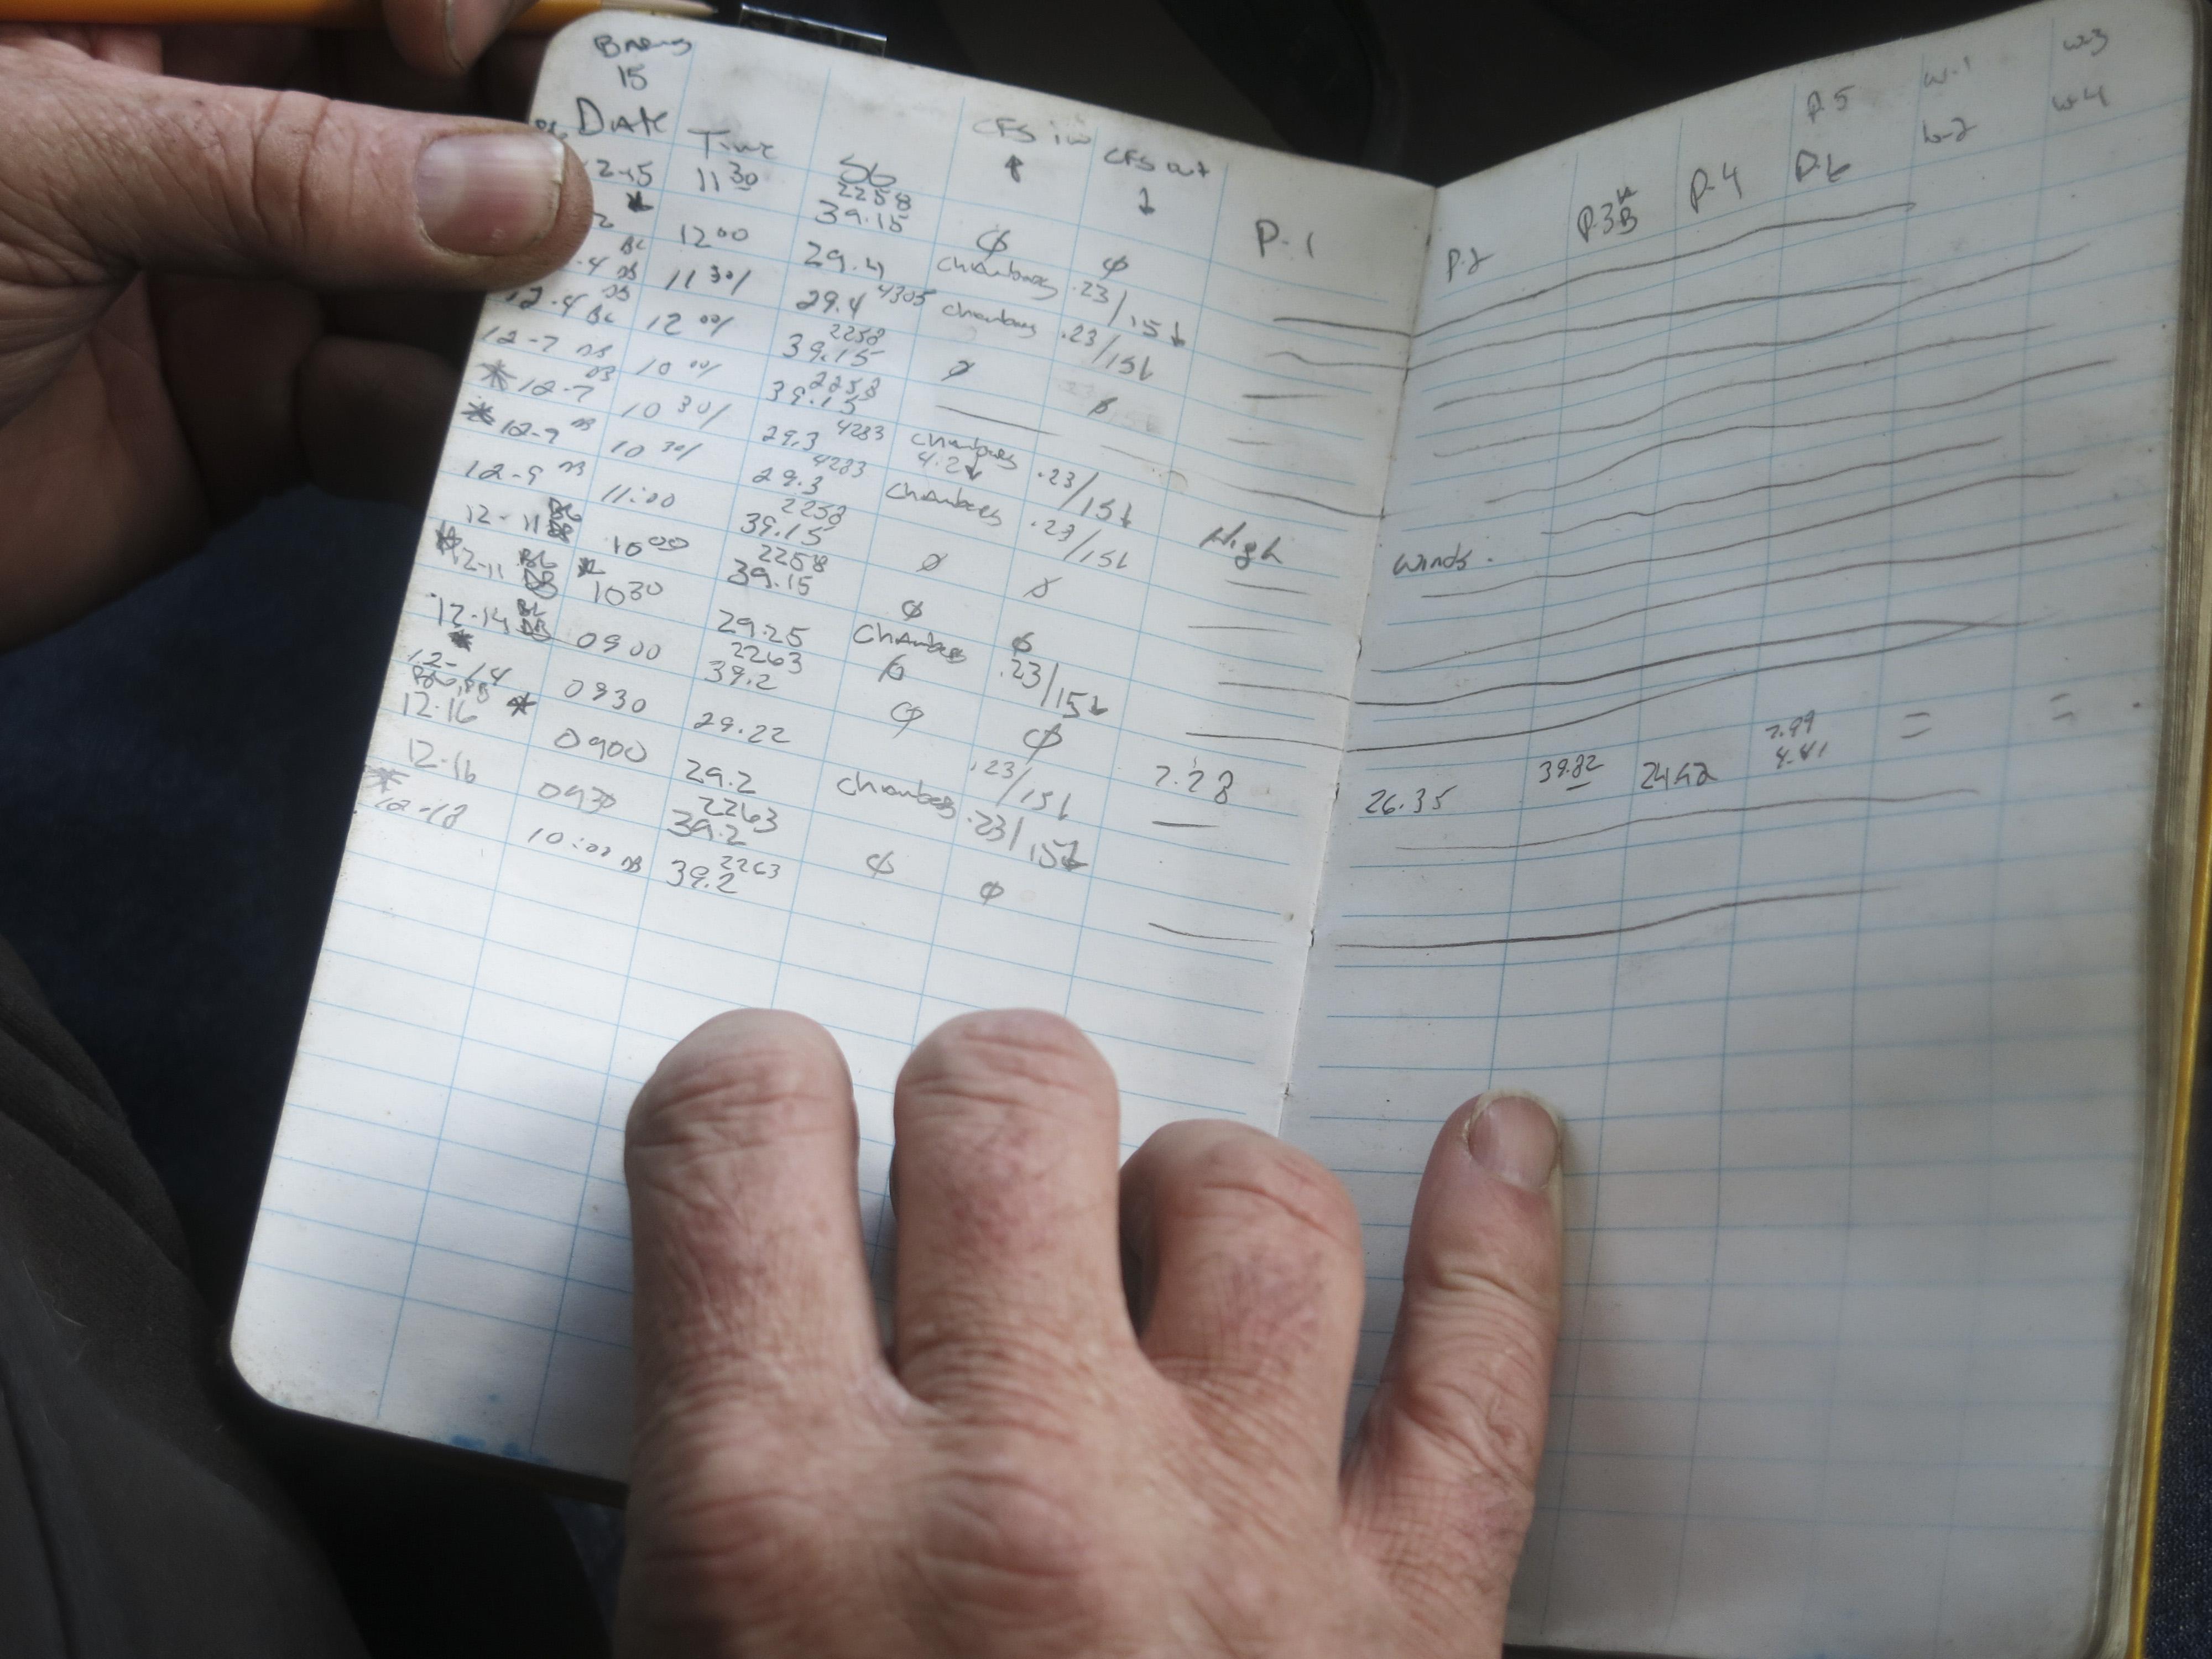 Photo: Reservoir caretaker 4 | Doug Billingsley takes notes